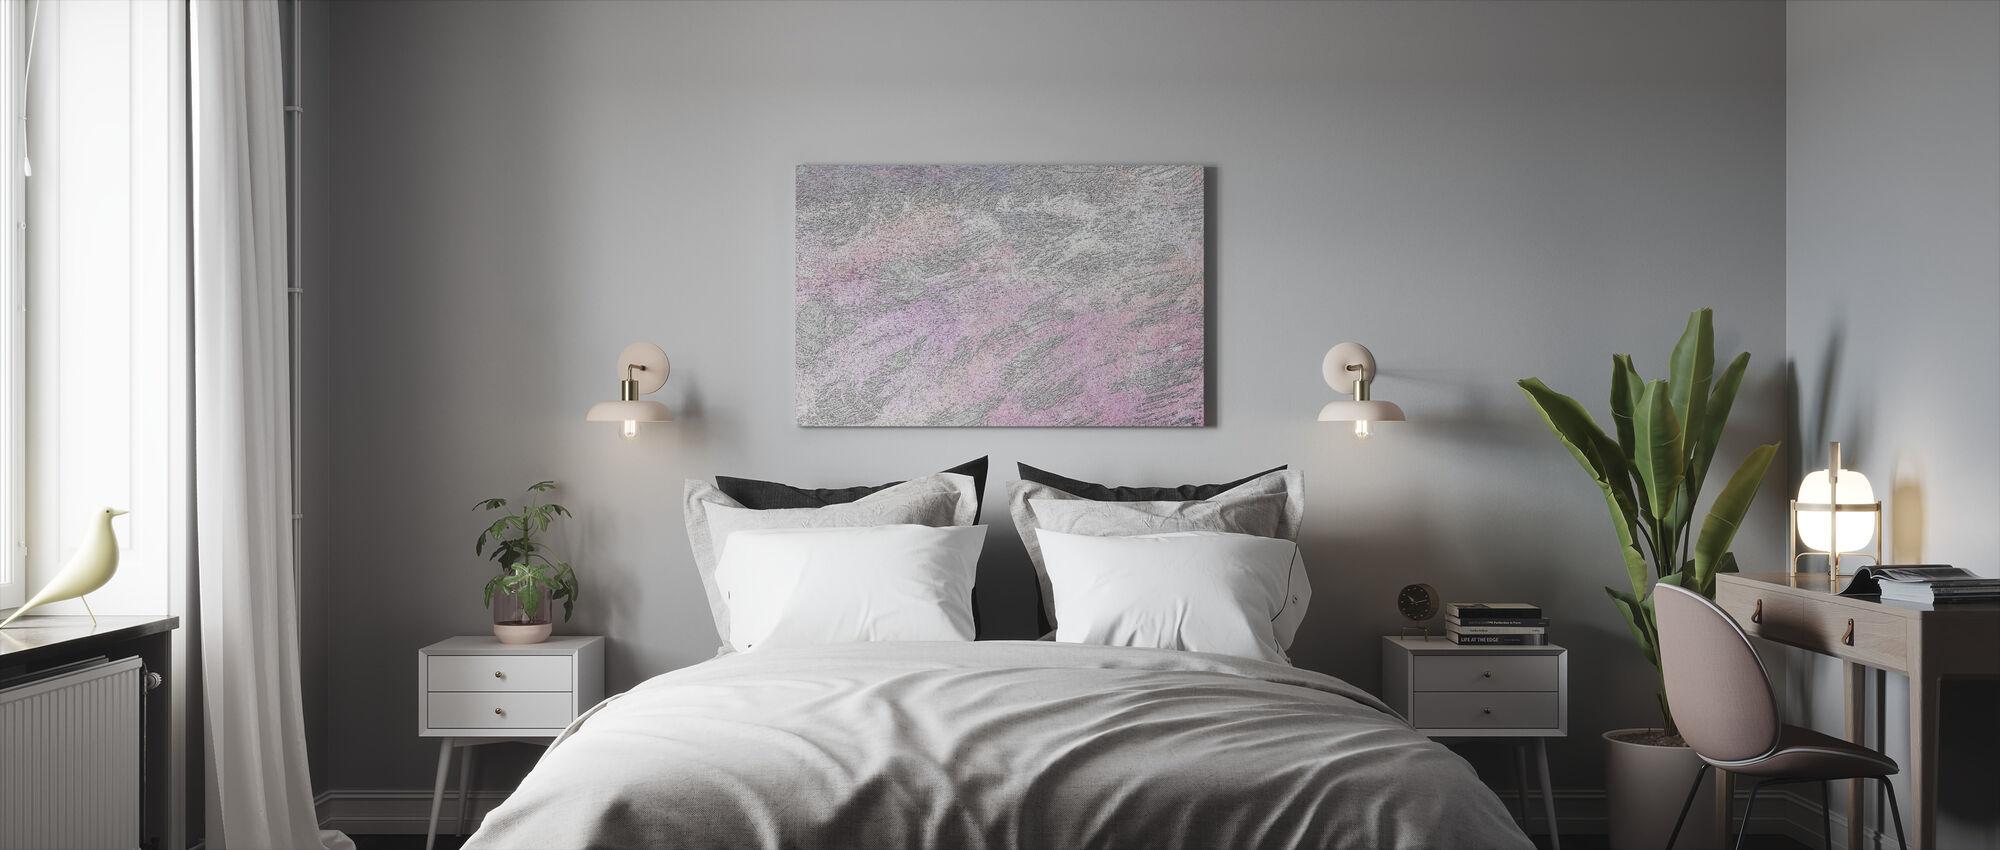 Pinkys Dream - Canvas print - Bedroom